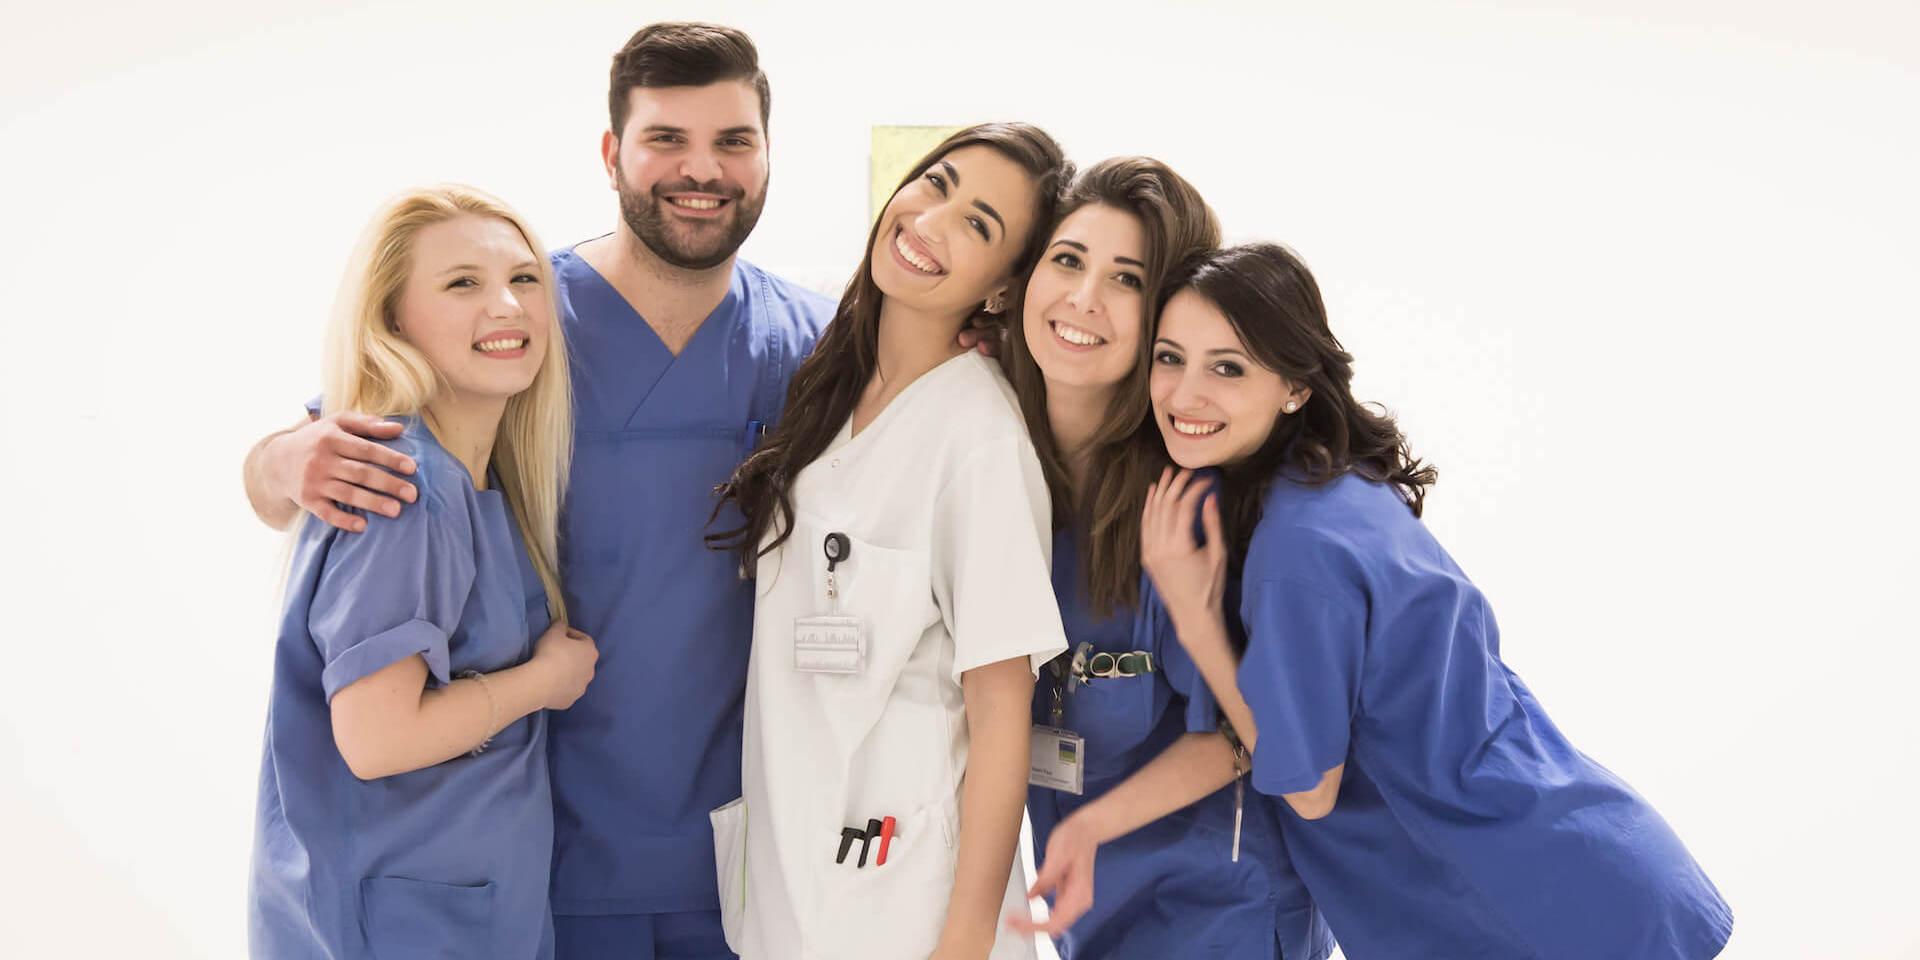 Arbeiten als Pflegefachfrau und Pflegefachmann in Deutschland - Enfermeiros para hospitais alemães - Work as a nurse and midwife in Germany - Lavorare come infermiere/a e ostetrica/o in Germania - Trabajar como enfermera/o en Alemania